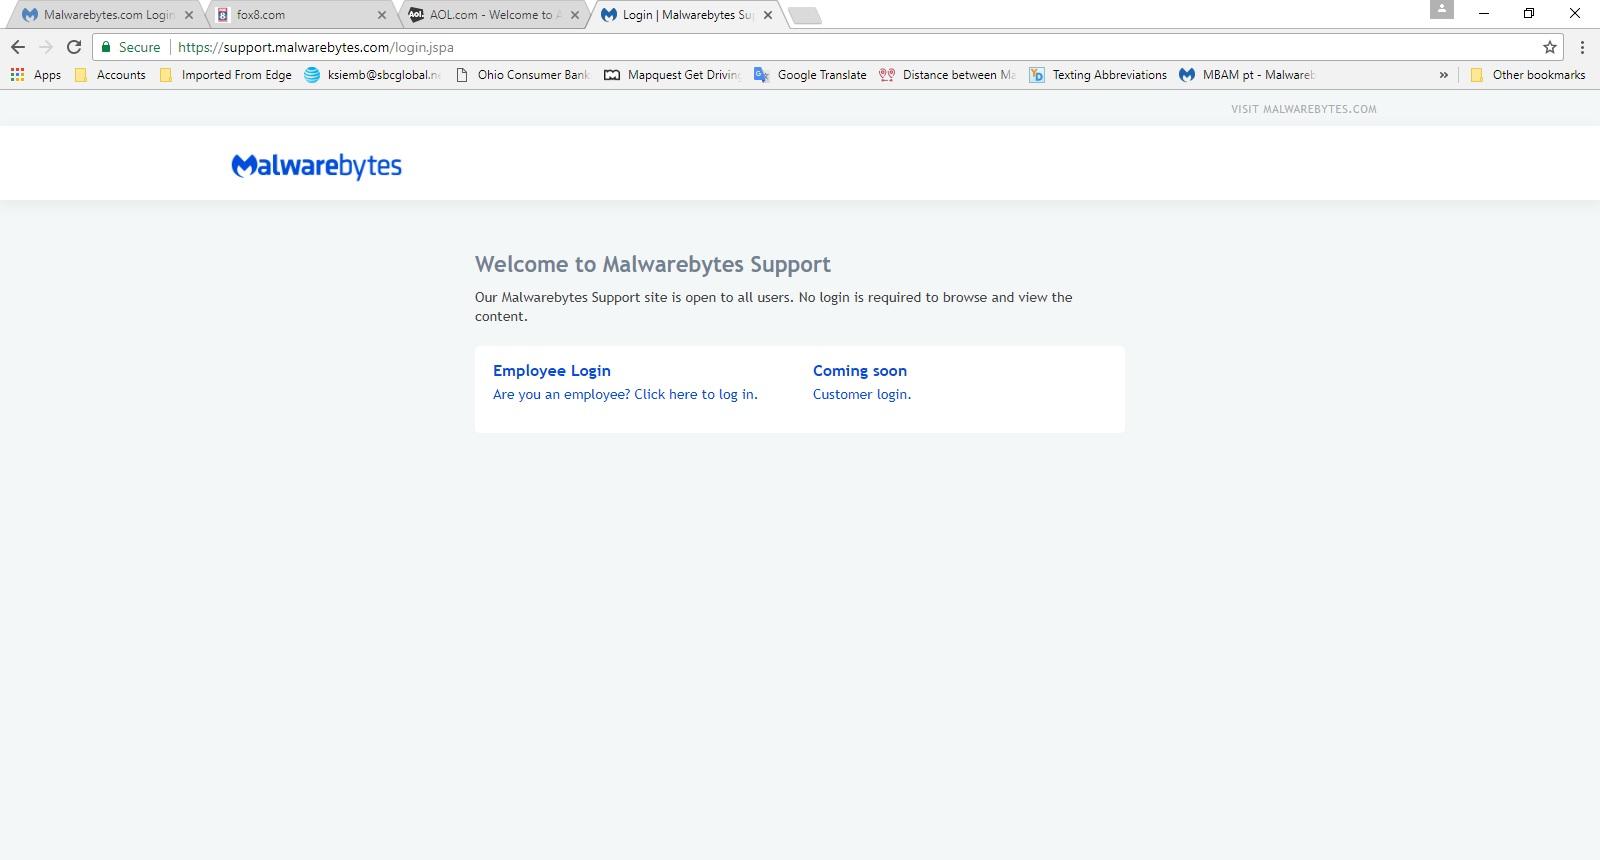 Malwarebytes com Login - General Chat - Malwarebytes Forums